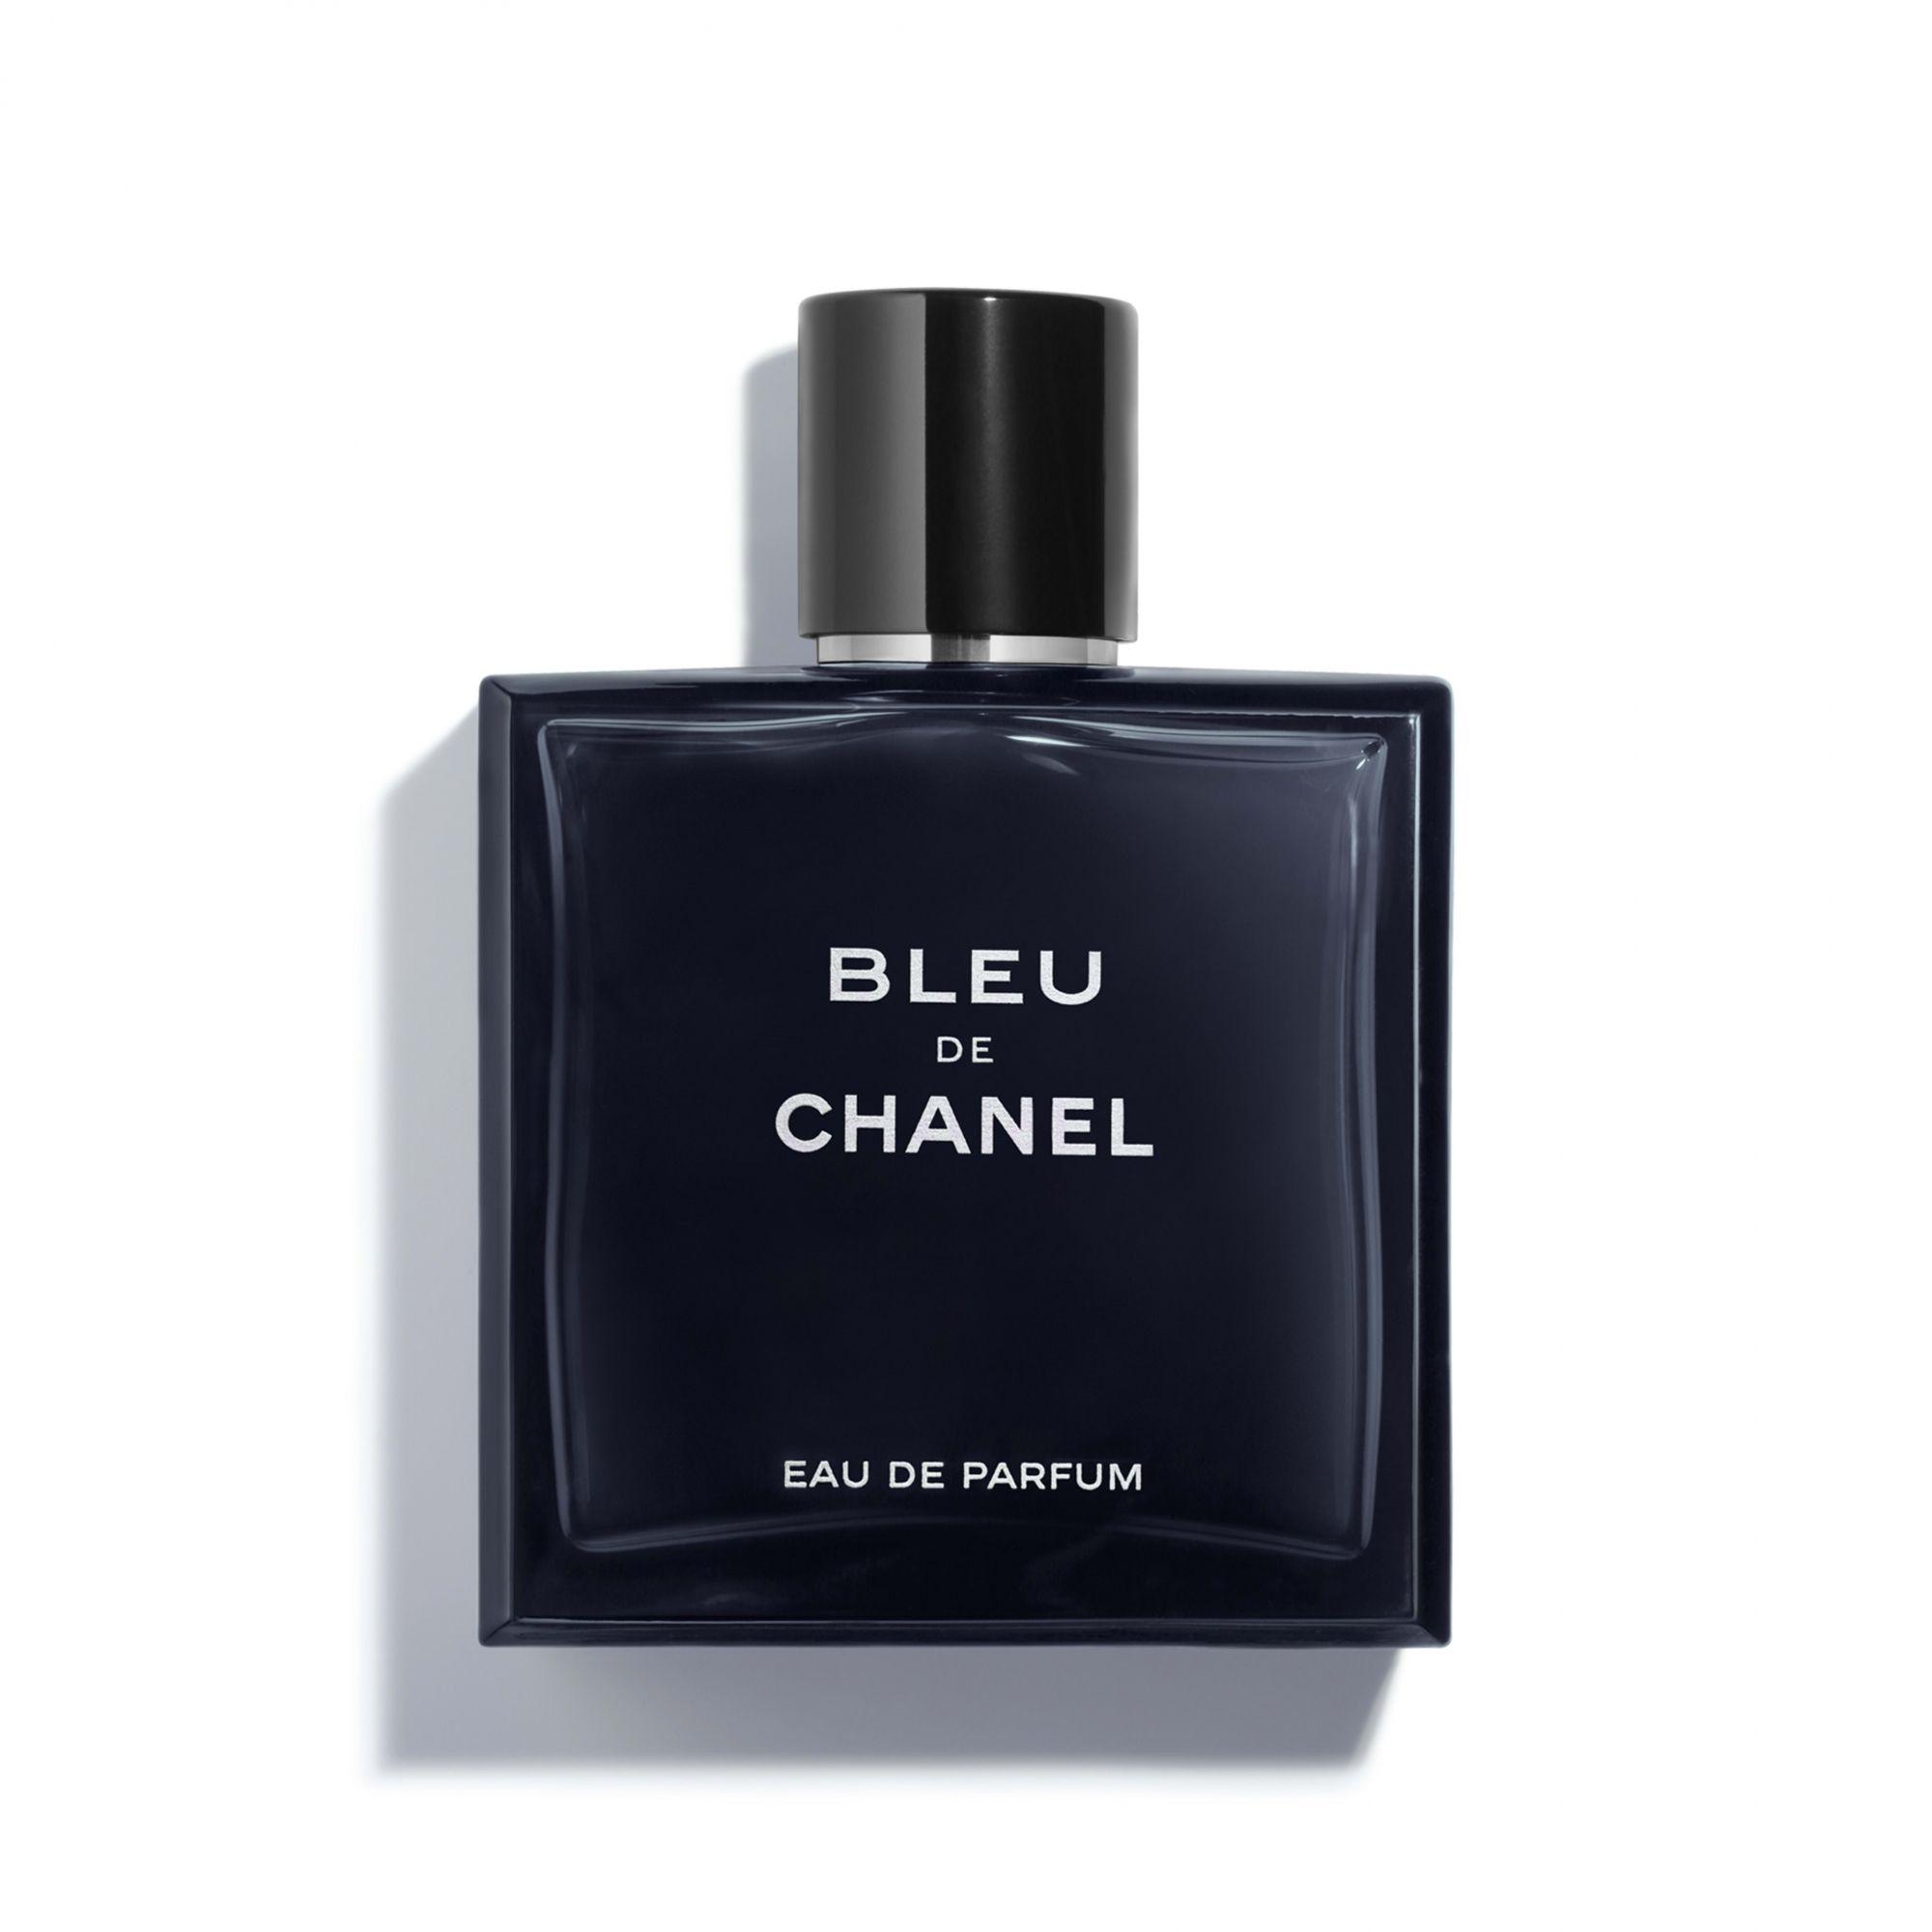 Bleu de Chanel - Eau de Parfum - Perfume Masculino